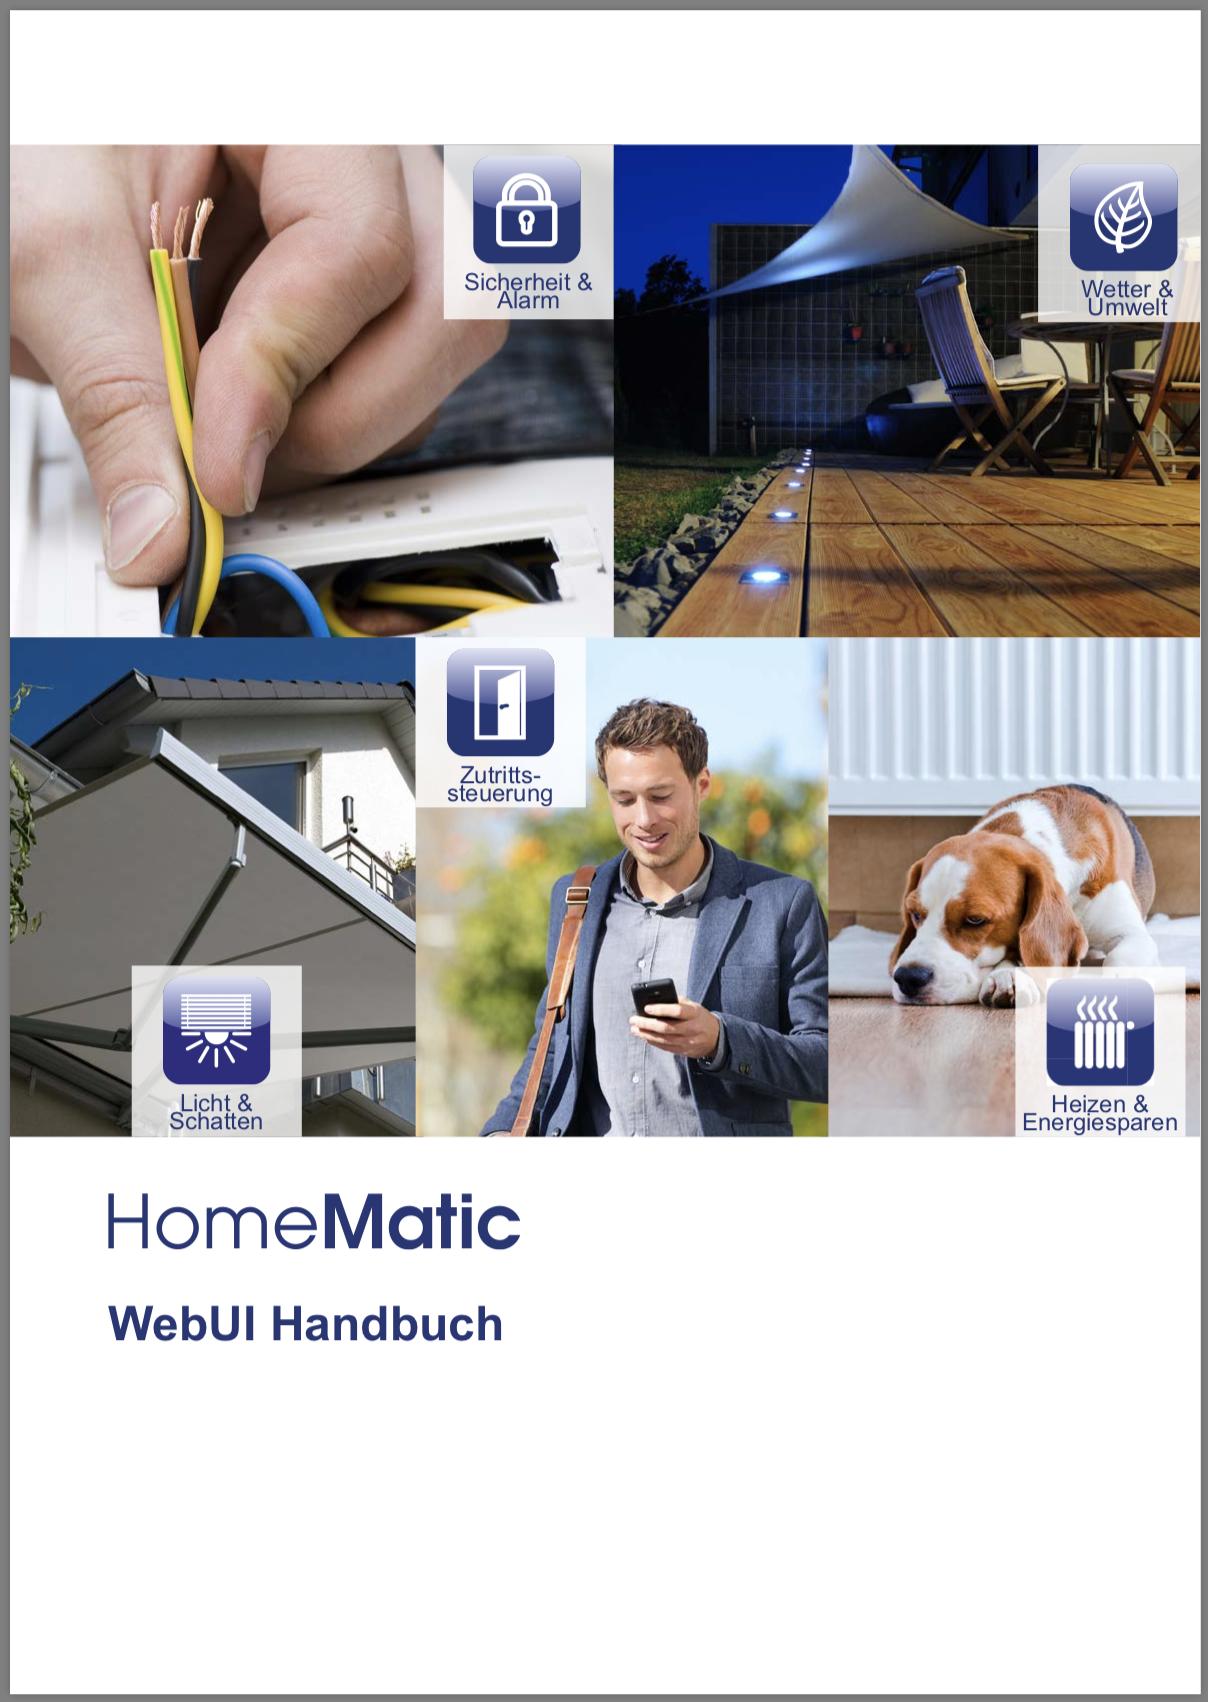 homematic smart home zentrale ccu3 inklusive aio creator. Black Bedroom Furniture Sets. Home Design Ideas